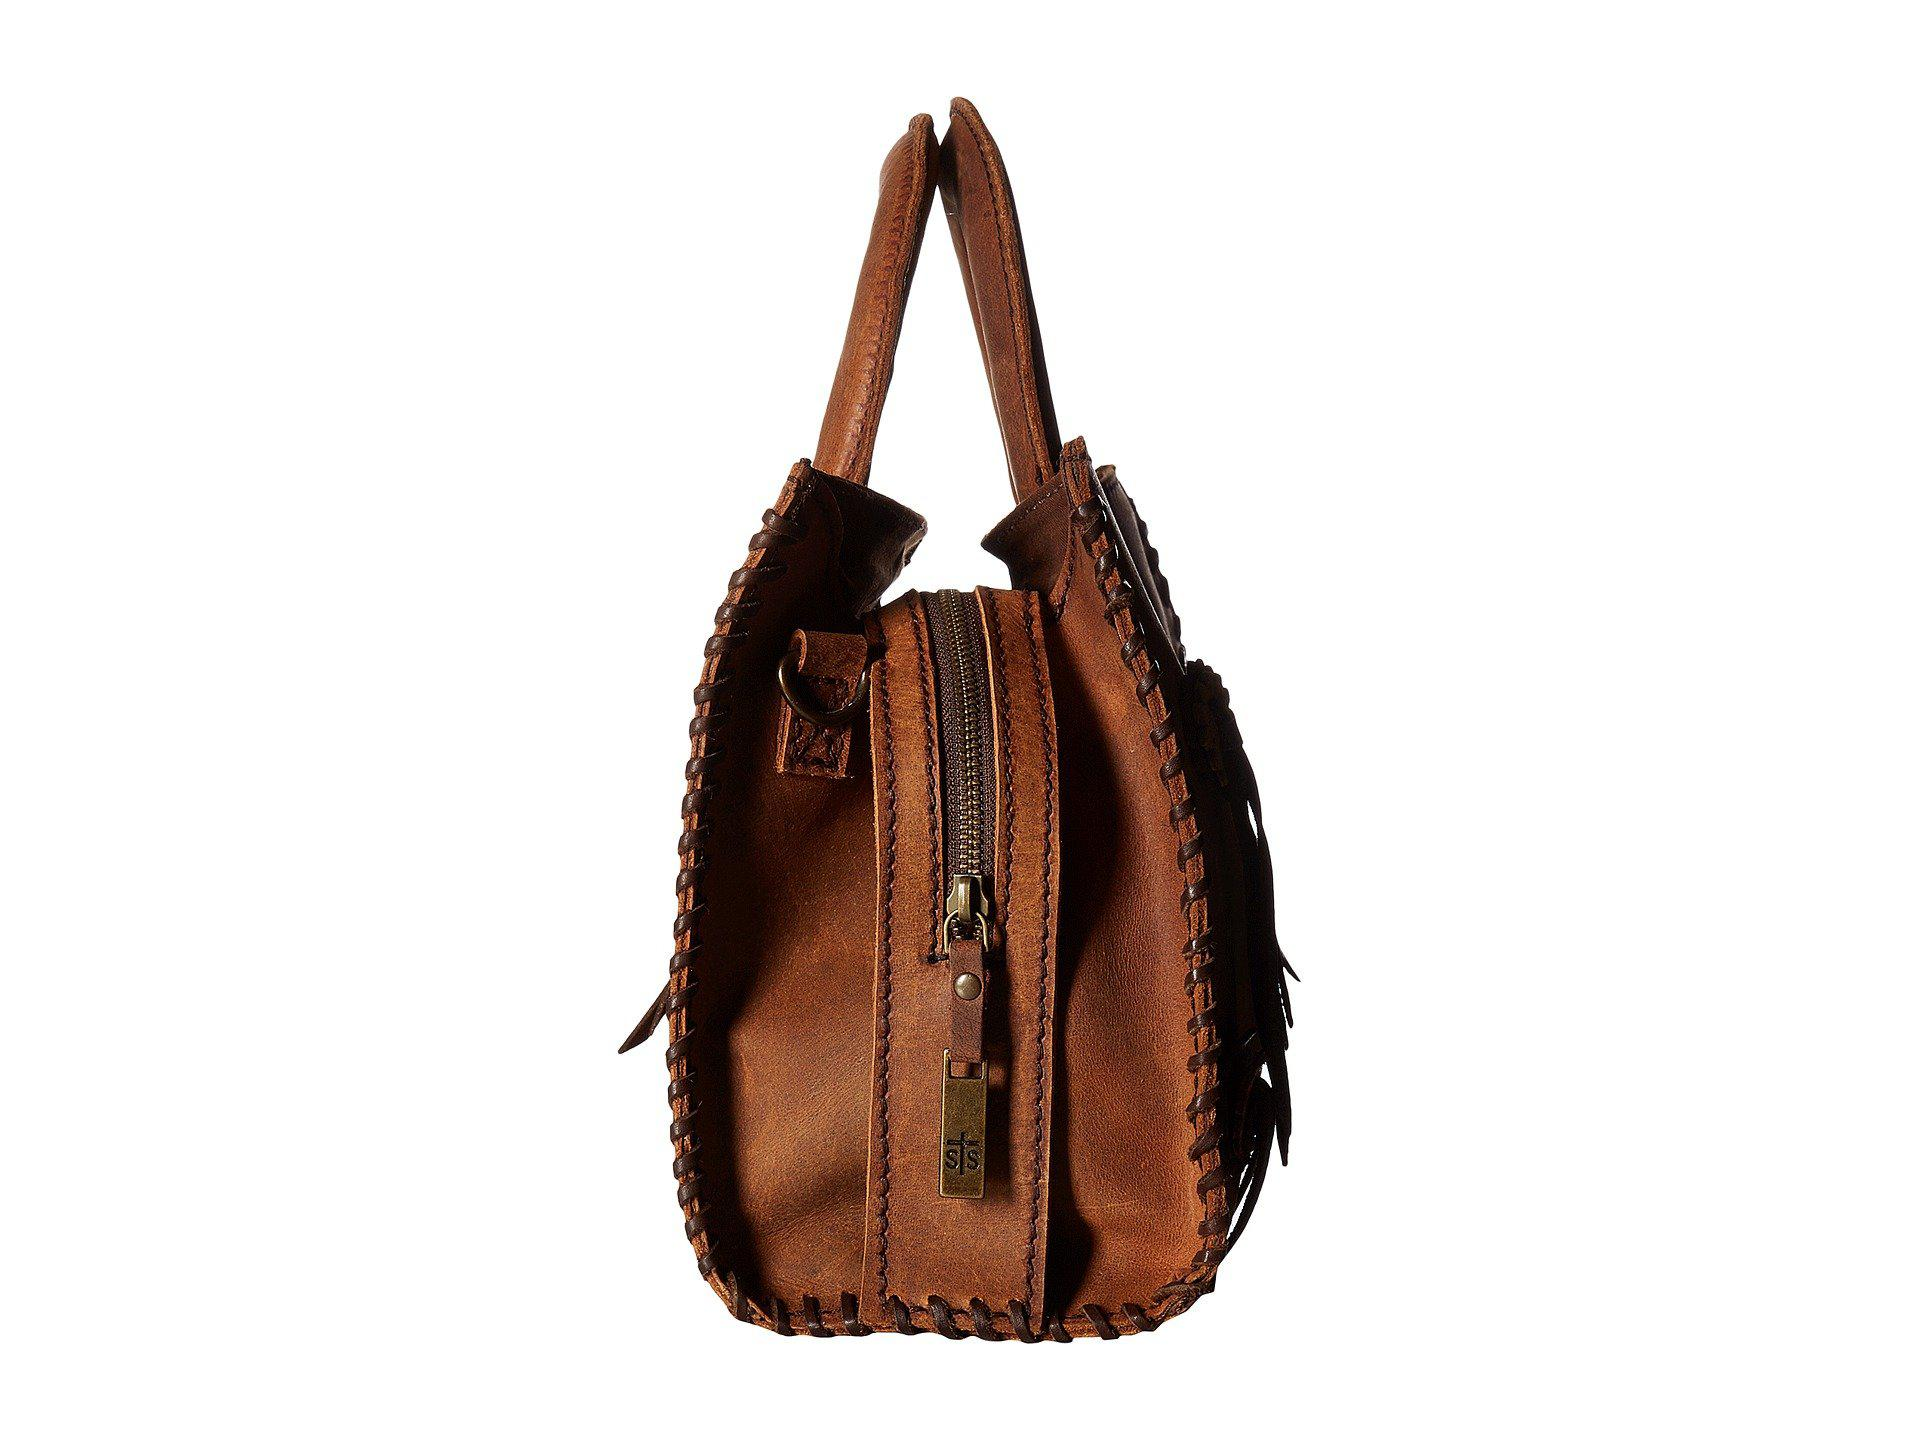 StS Ranchwear Small Chaps Satchel (Brown) Satchel Handbags Q4kADEL58